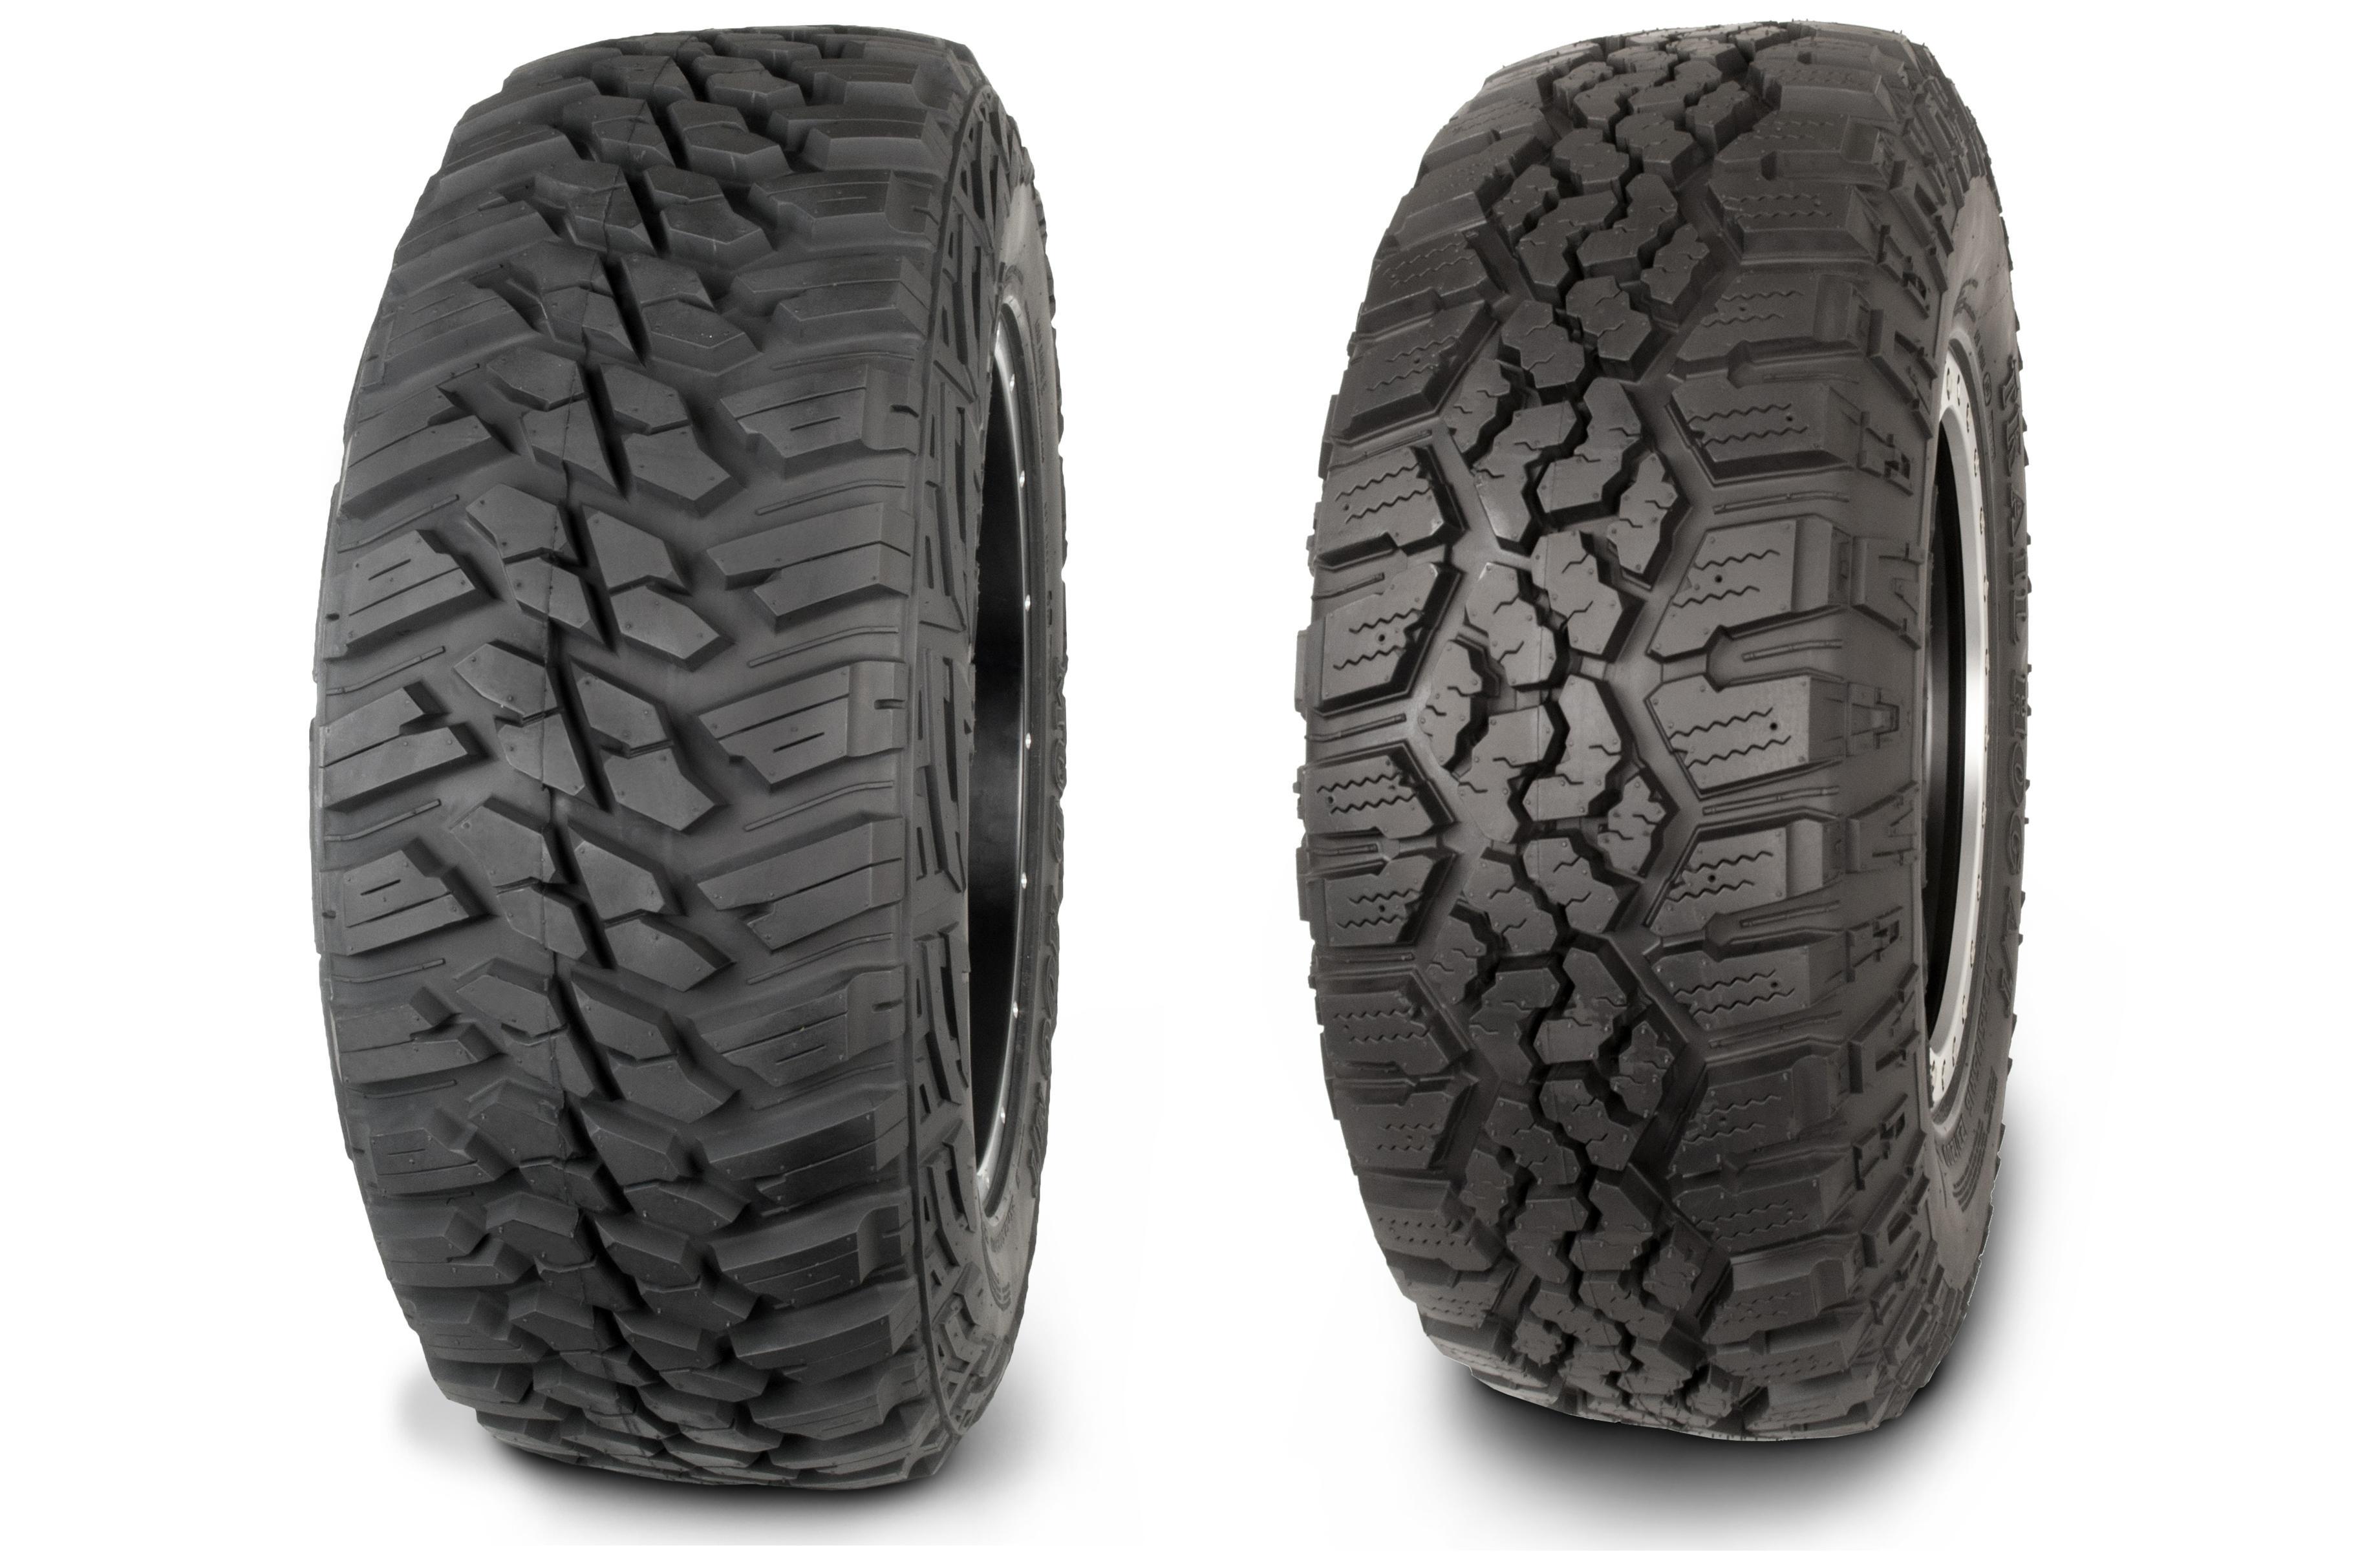 Kanati Tires расширяет размерный диапазон шин для пикапов